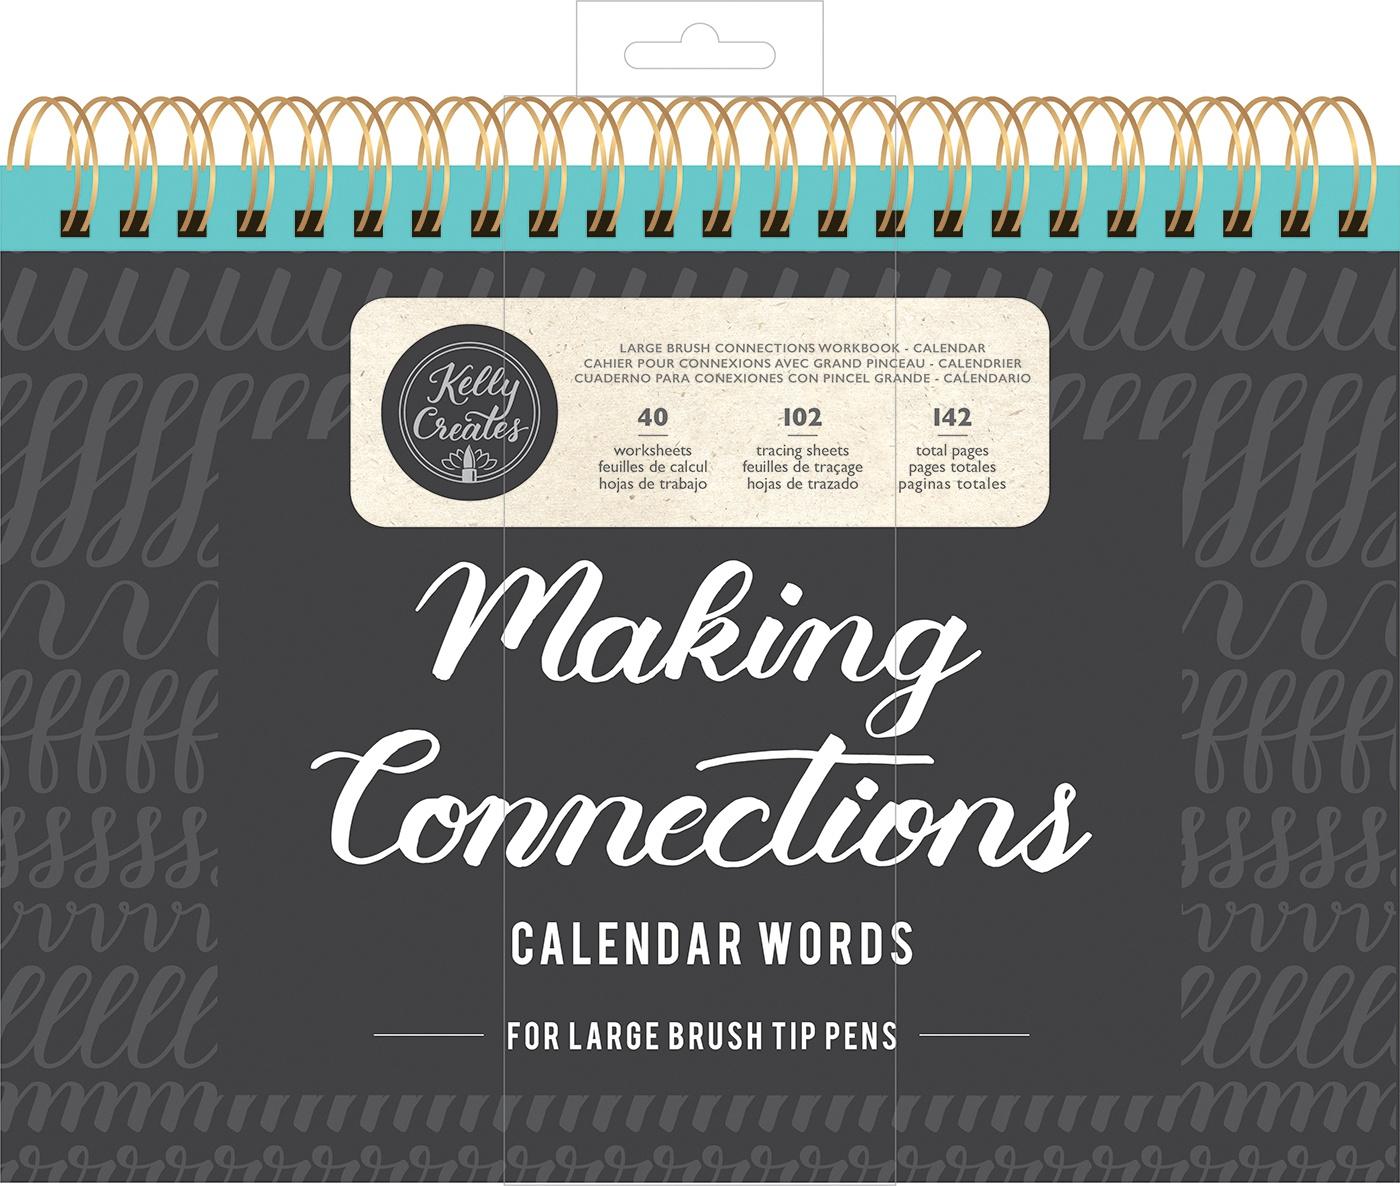 Kelly Creates Large Brush Workbook 11.6X10 142/Pkg-Connections/Calendar